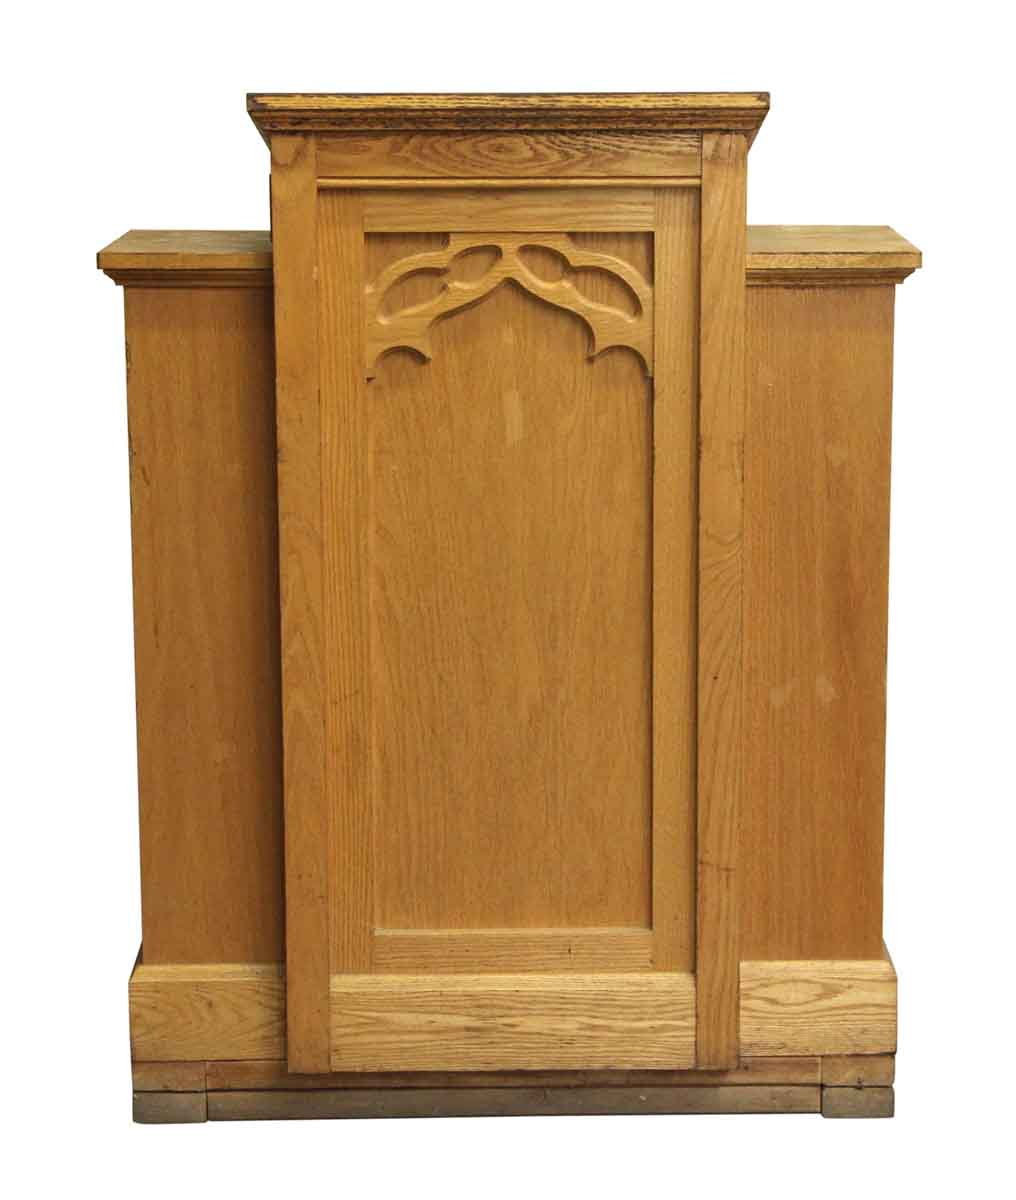 Religious Antiques - Antique Gothic Wooden Three Paneled Podium - Antique Gothic Wooden Three Paneled Podium Olde Good Things